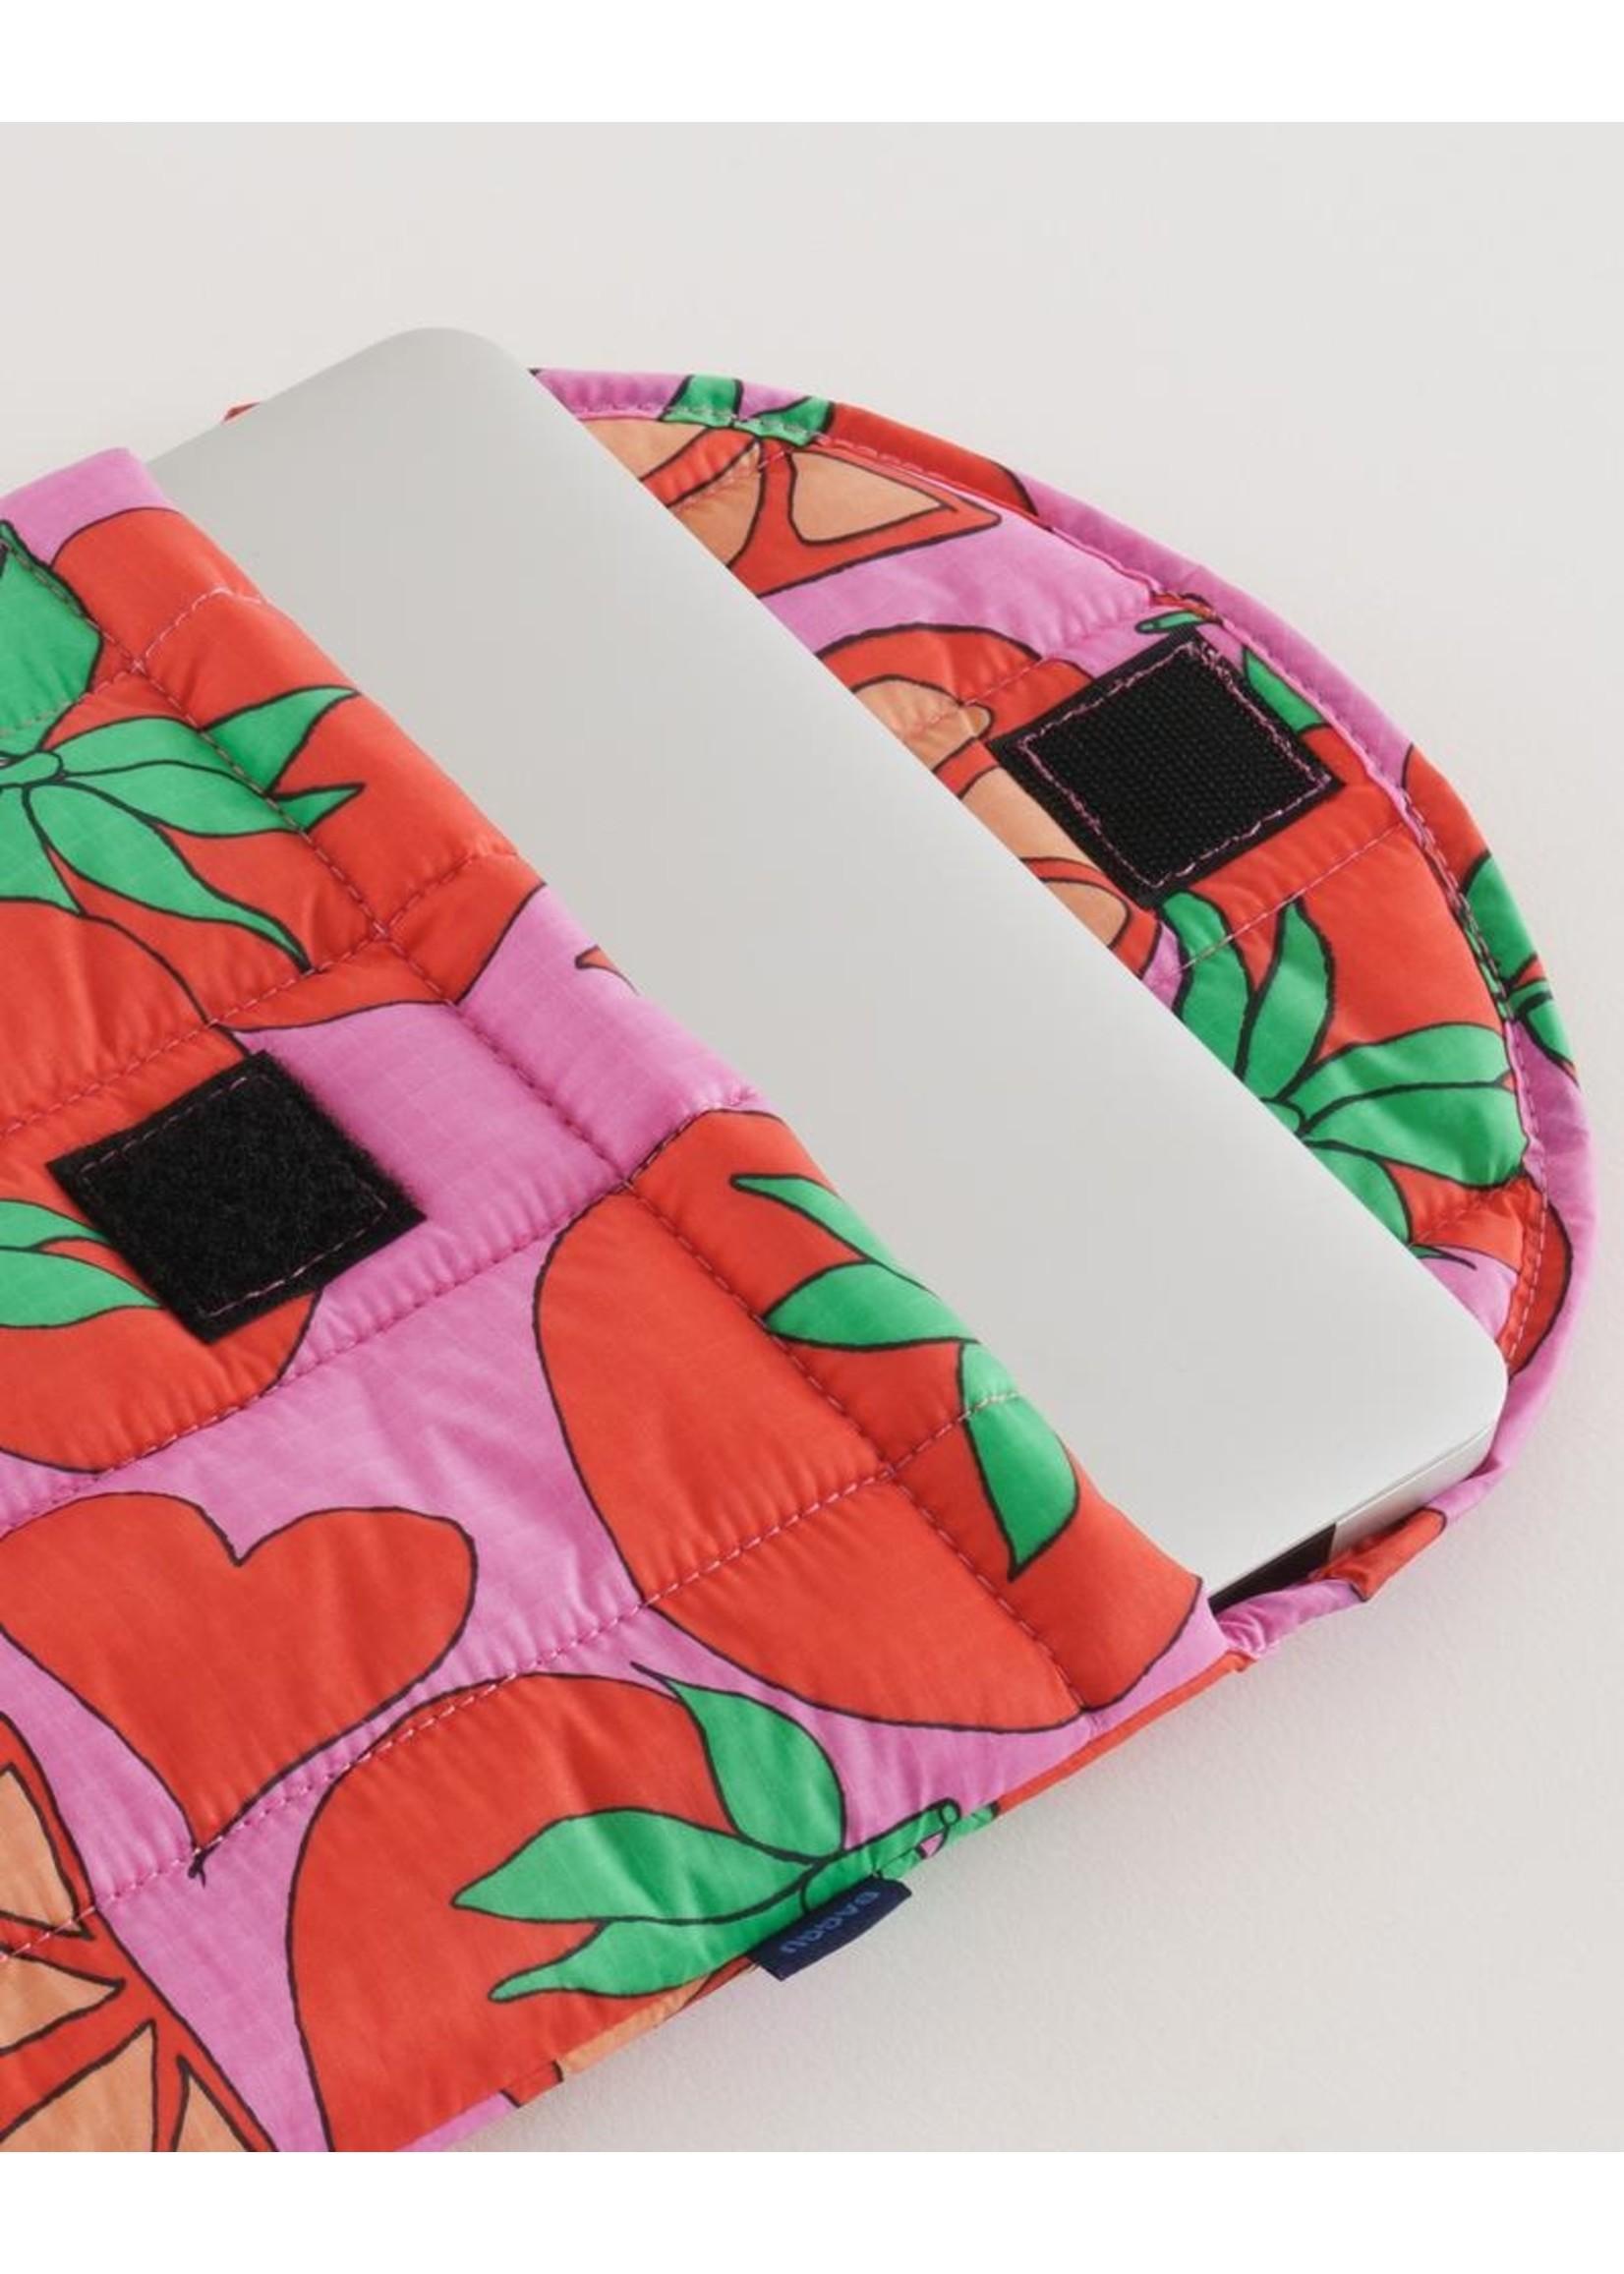 "Baggu Baggu Puffy Laptop Sleeve 13"" - Tomatoes"